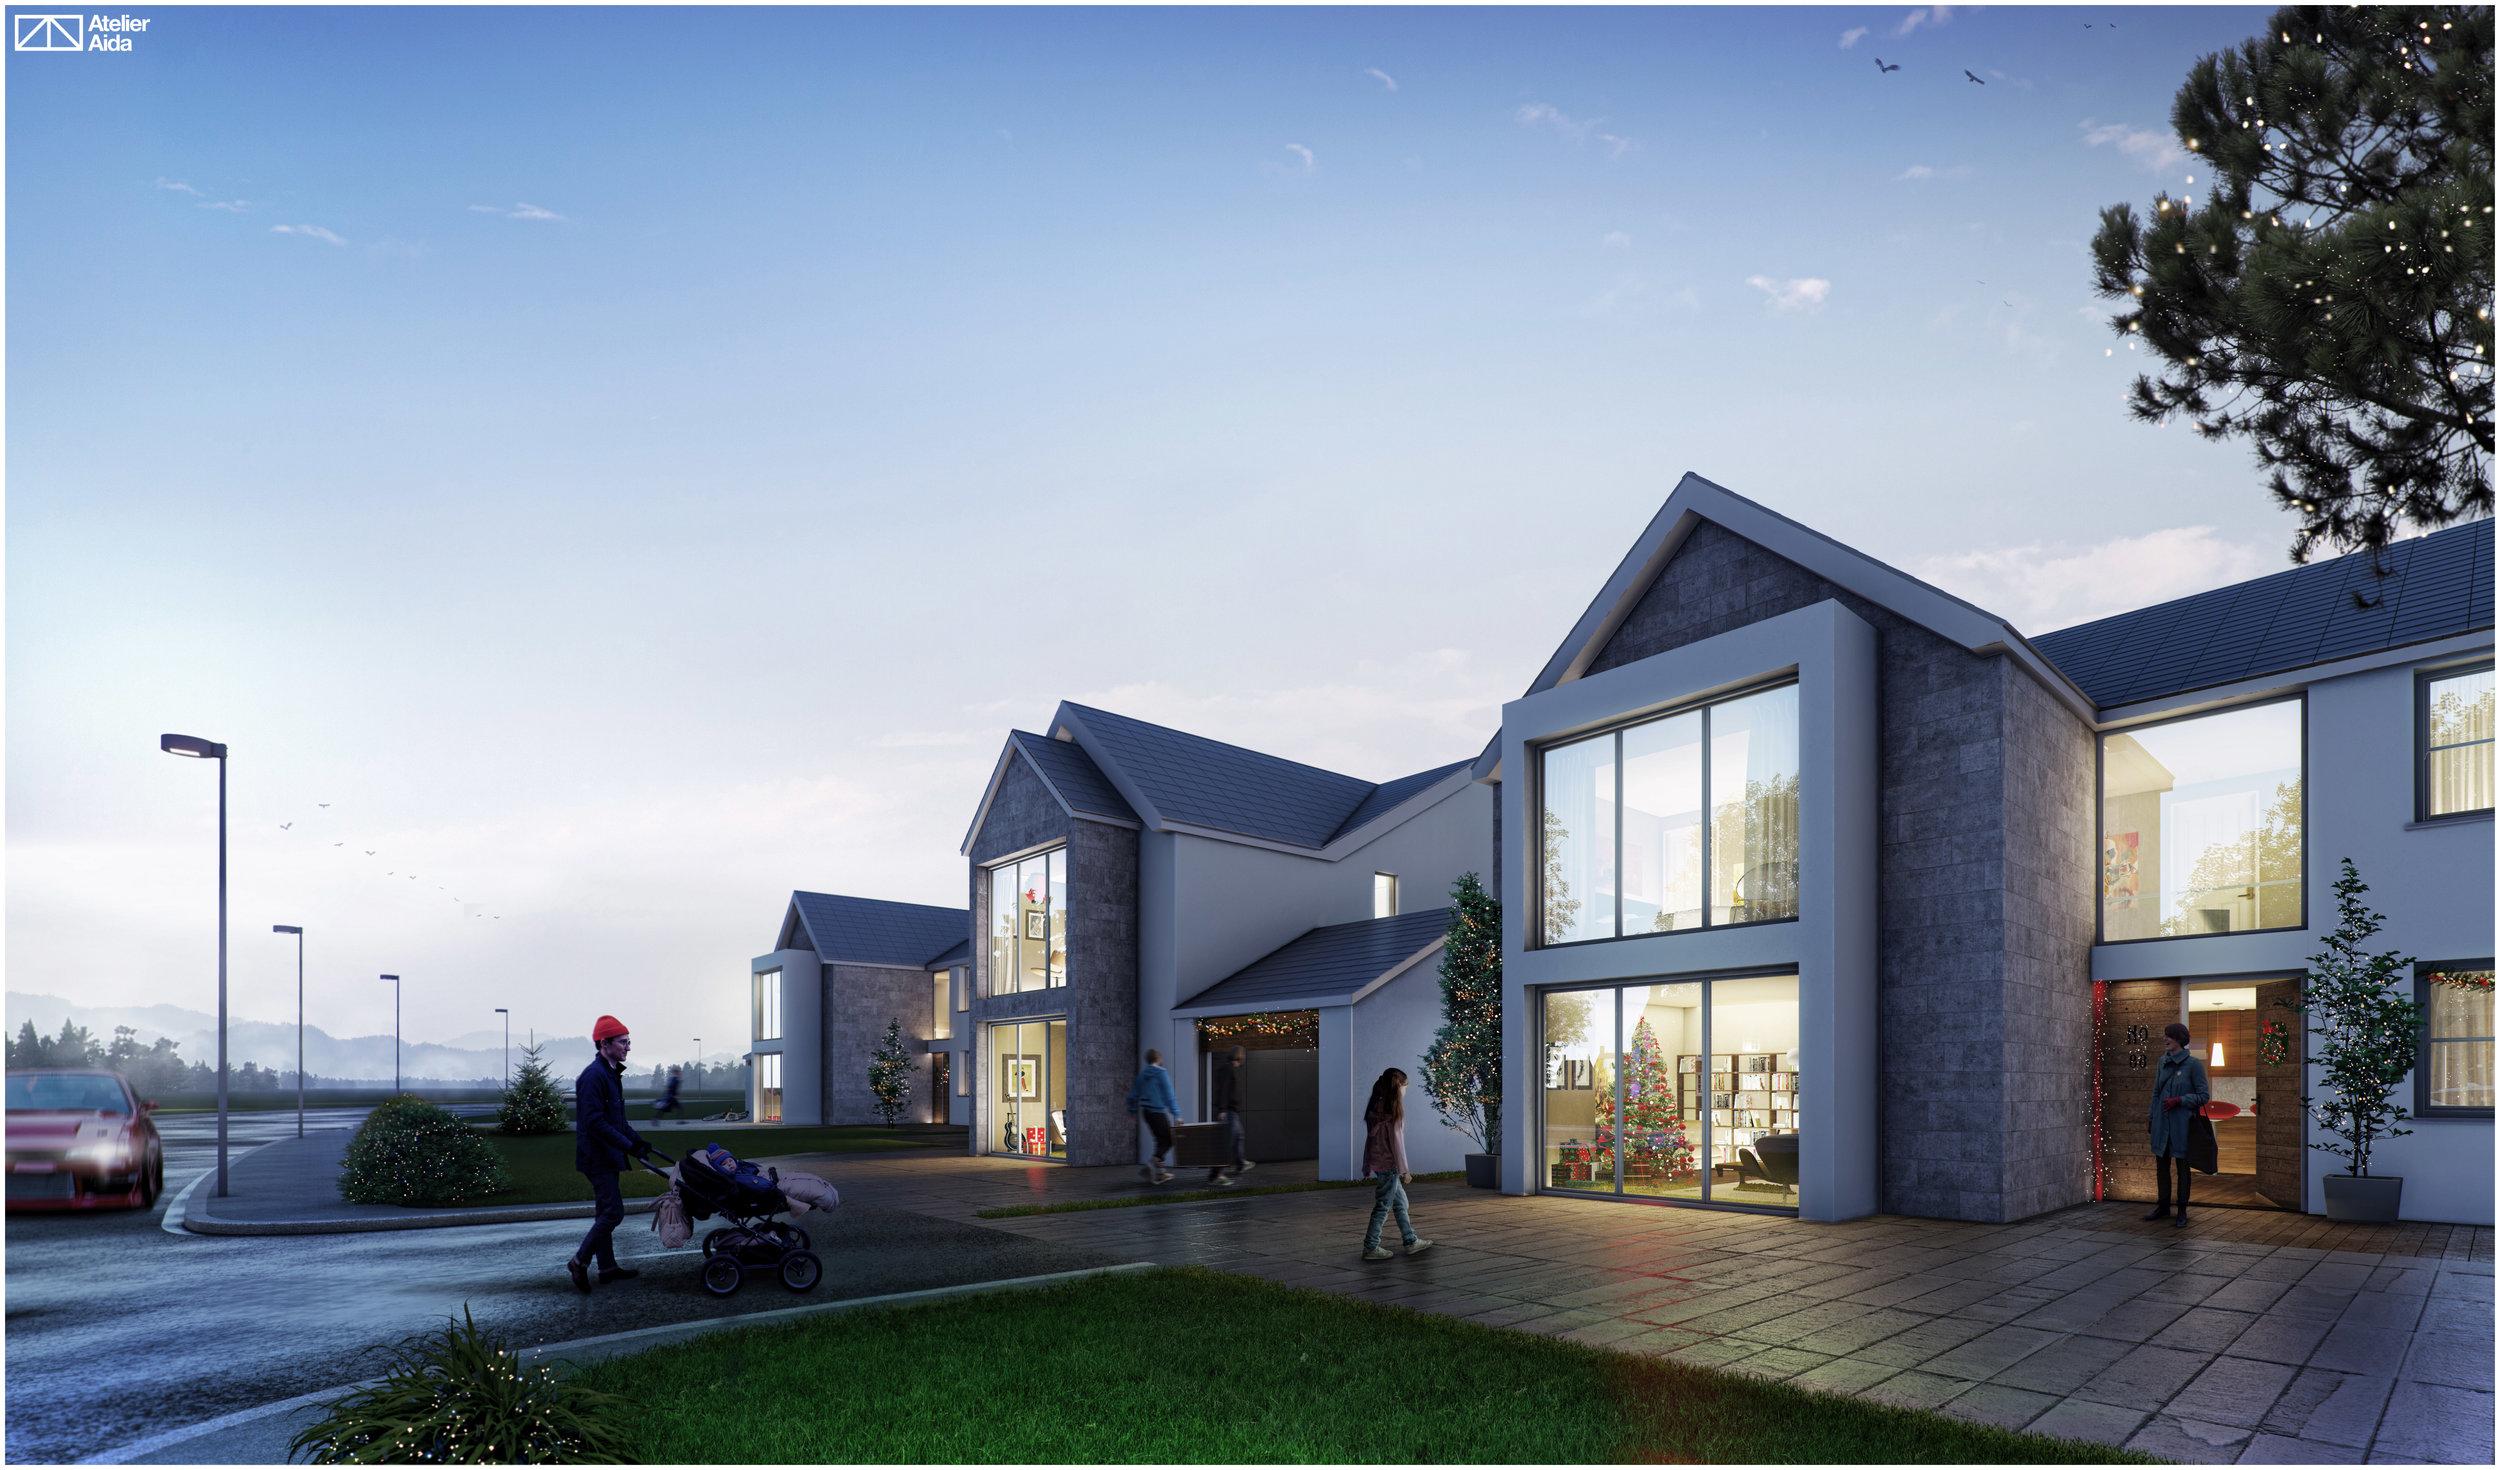 medium resolution of 3 new houses old way bishopstone swansea